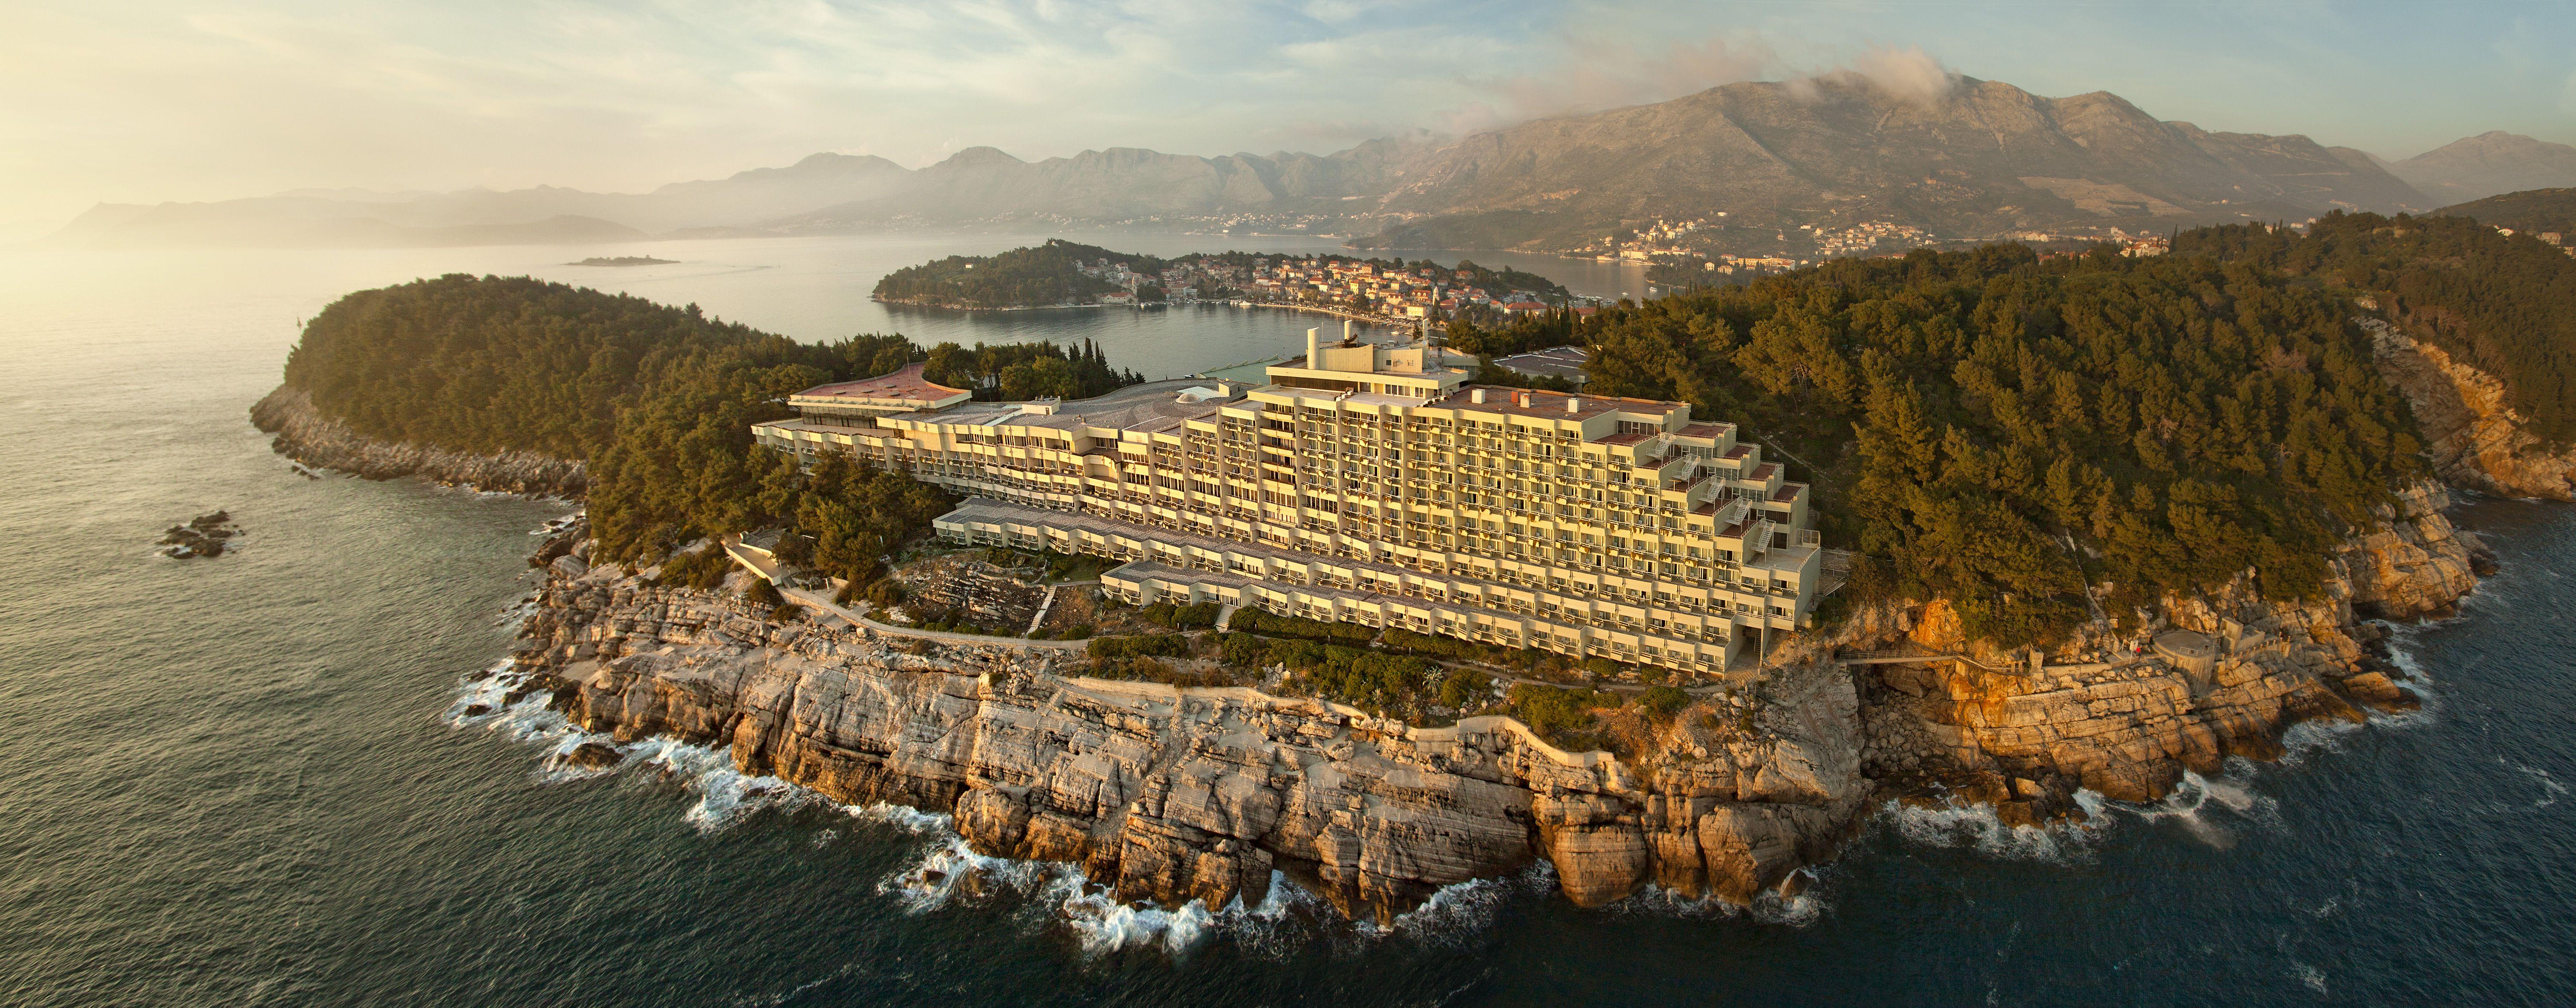 Hotel croatia cavtat hotel aerial view adriatic luxury hotels